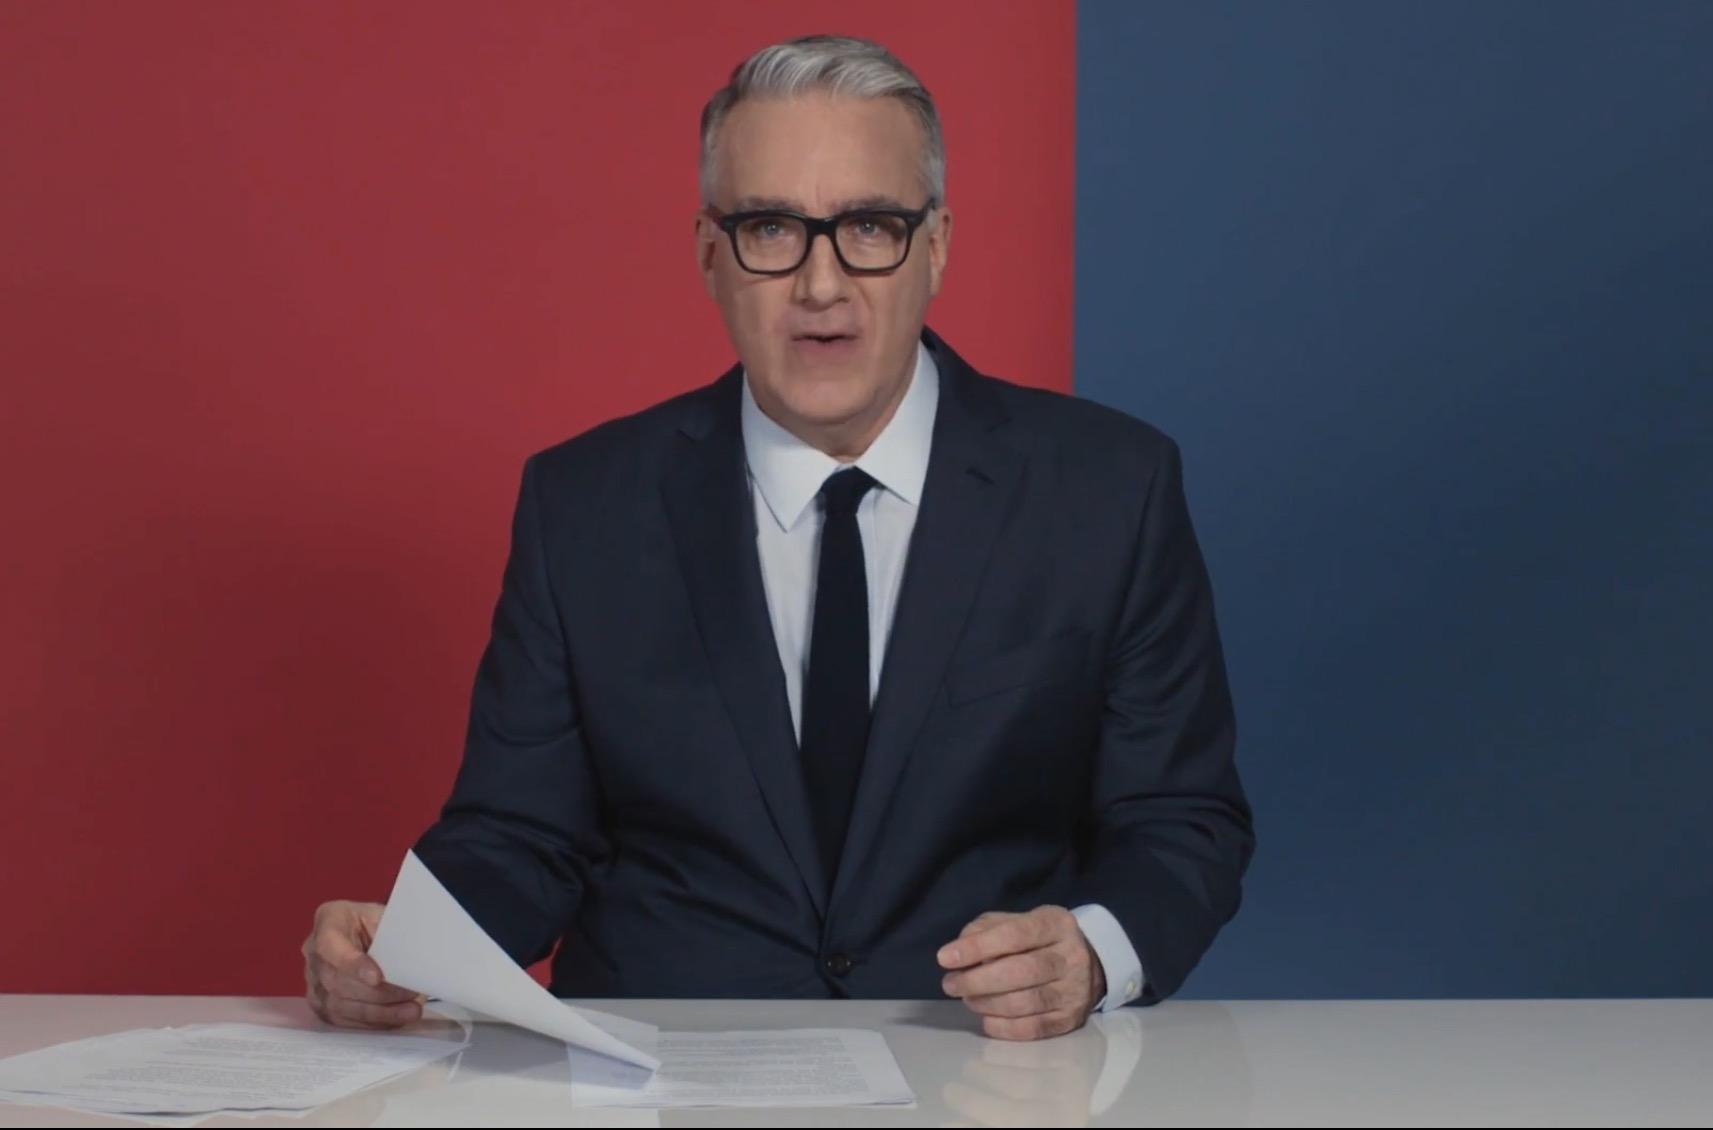 Keith Olbermann: Gutless Republicans Face Political Apocalypse For Enabling Trump